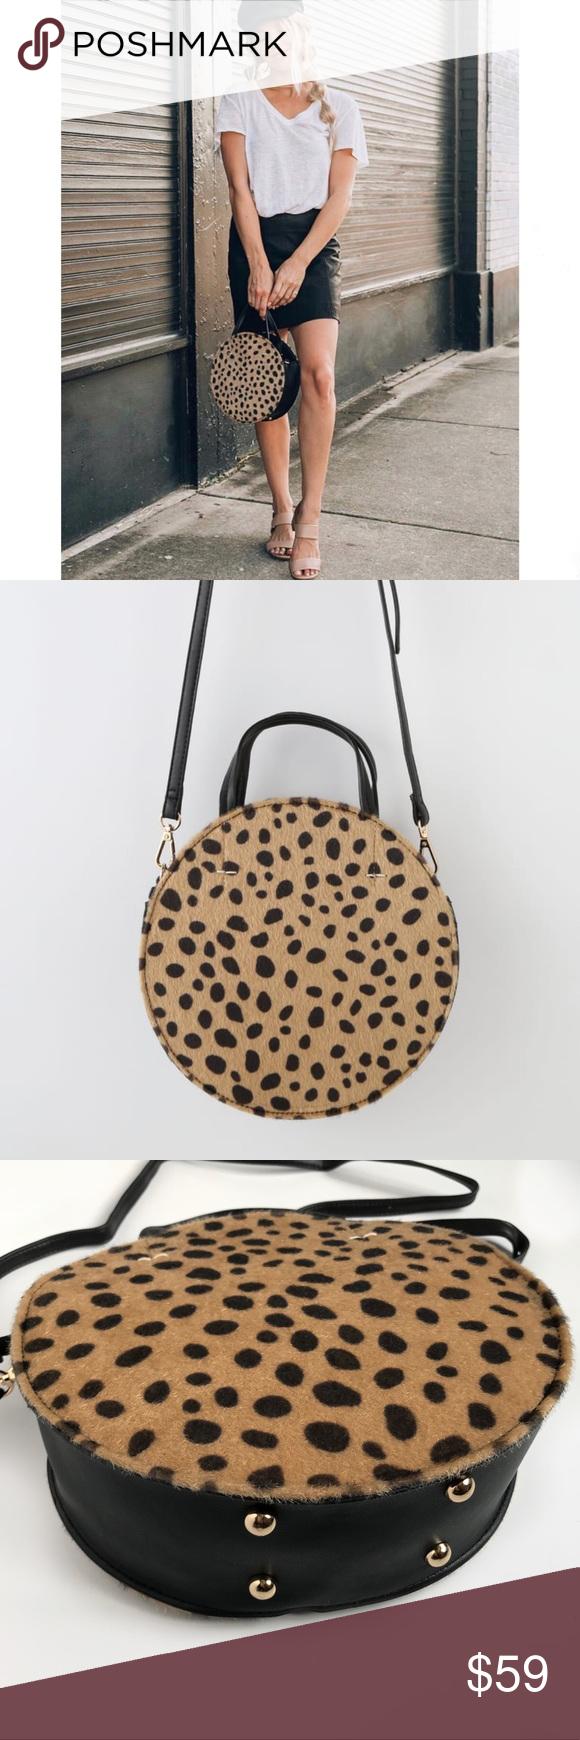 df7d038b07f8 Leopard print circle bag Leopard print circle bag. • Fuzzy